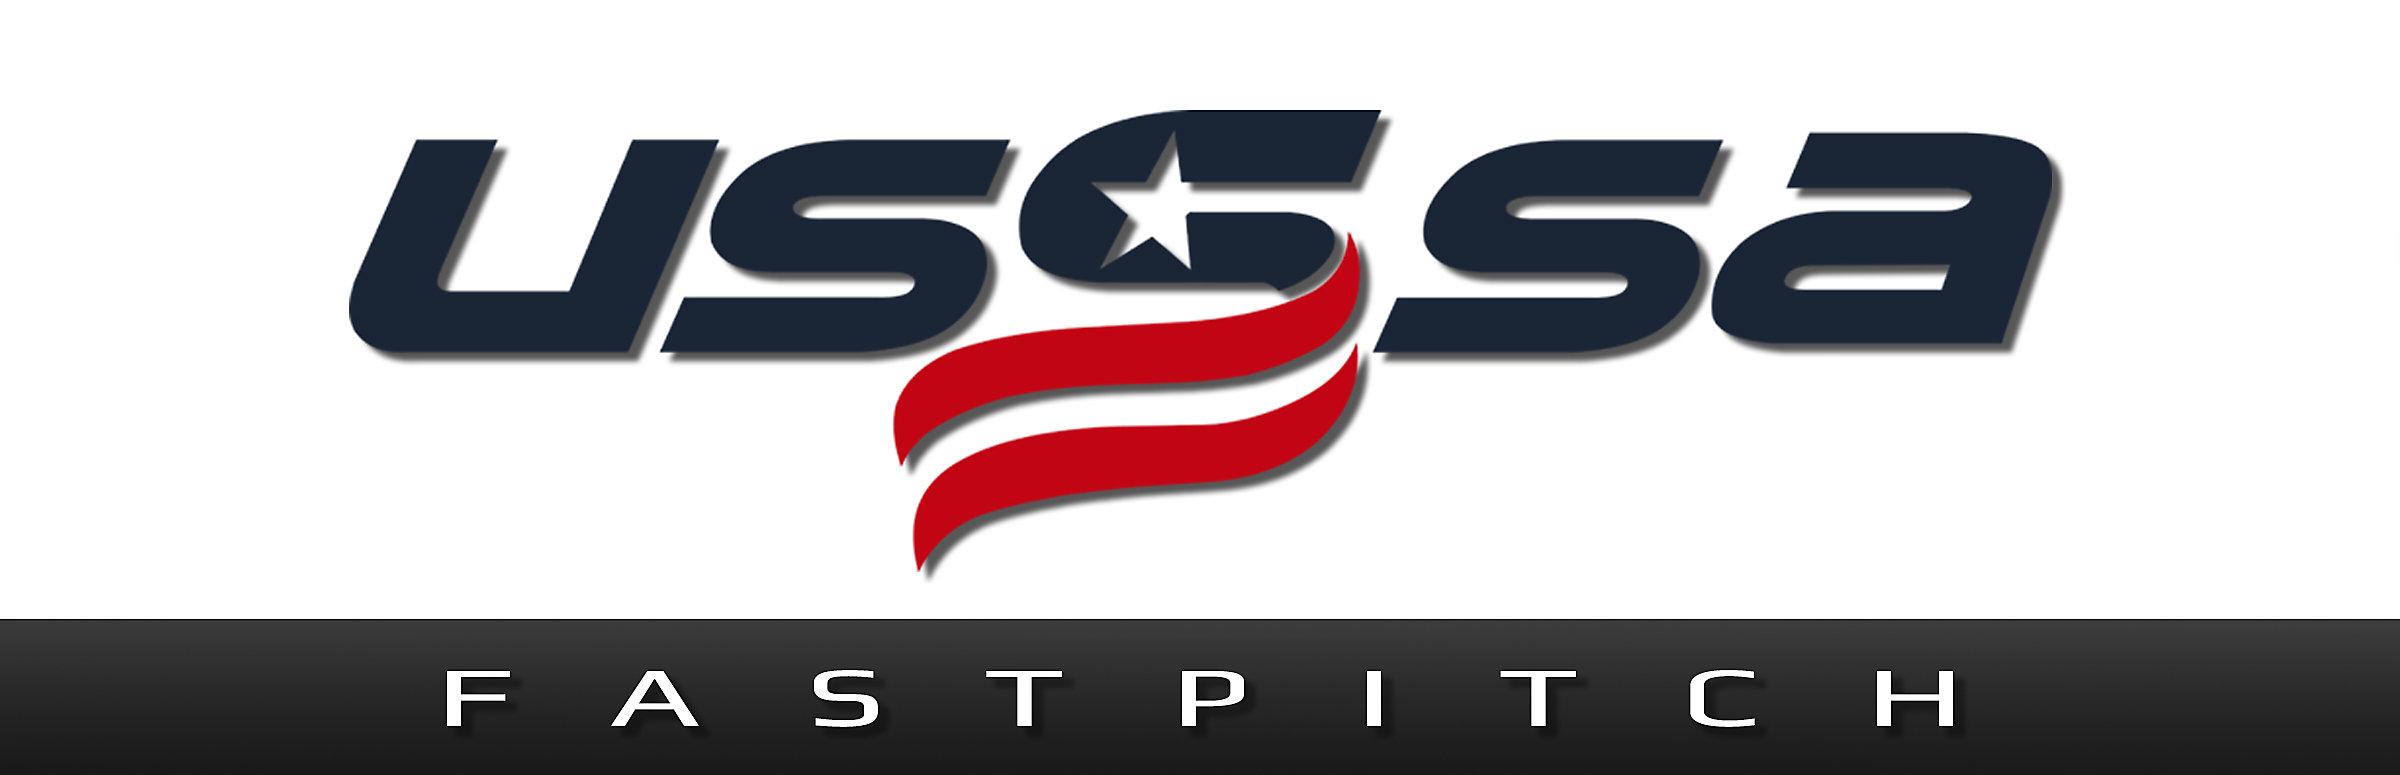 USSSA Fastpitch Umpire Gear